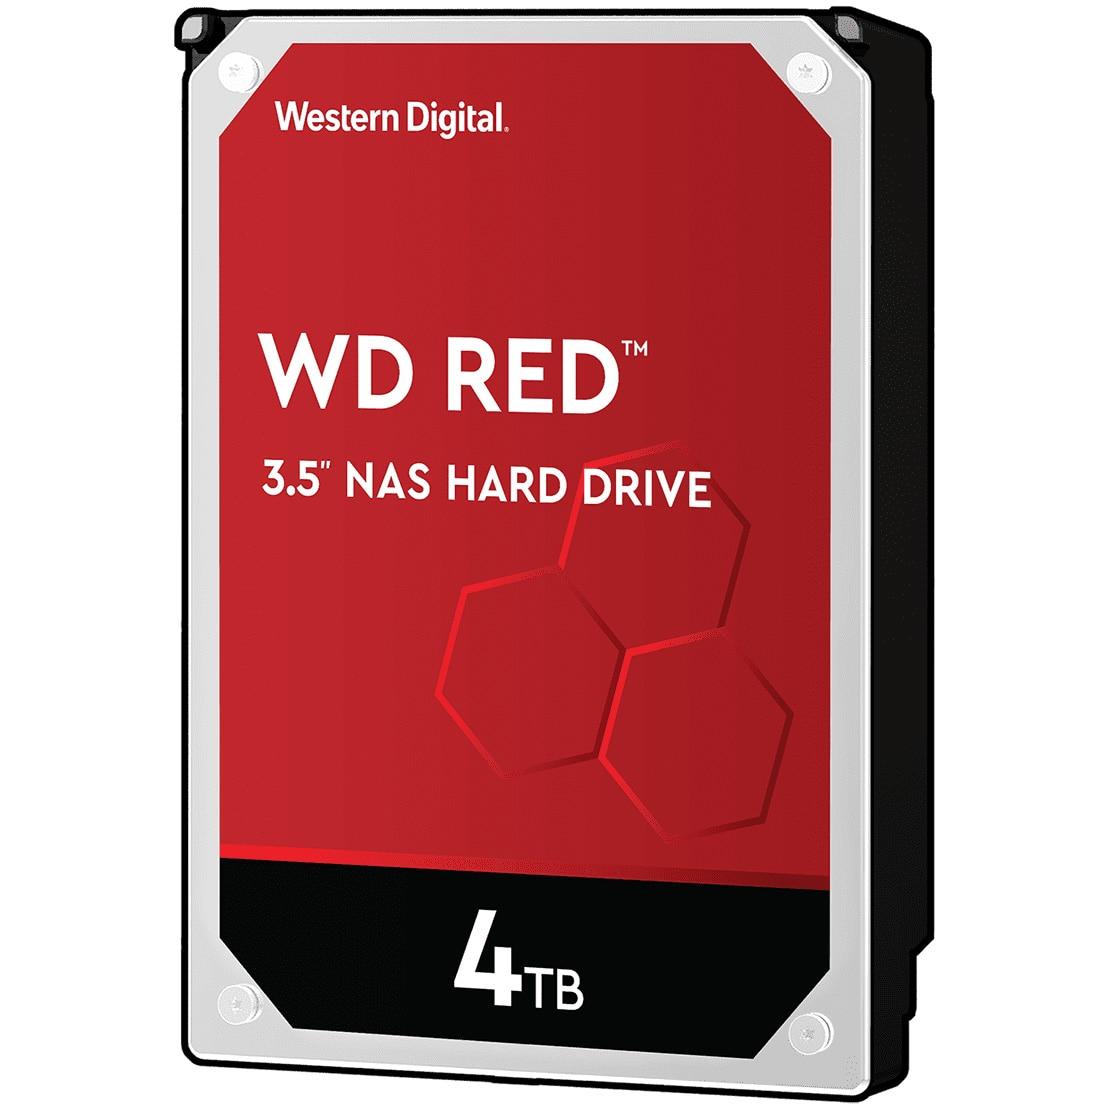 Fotografie HDD WD RED 4TB, 5400RPM, 256MB cache, SATA III